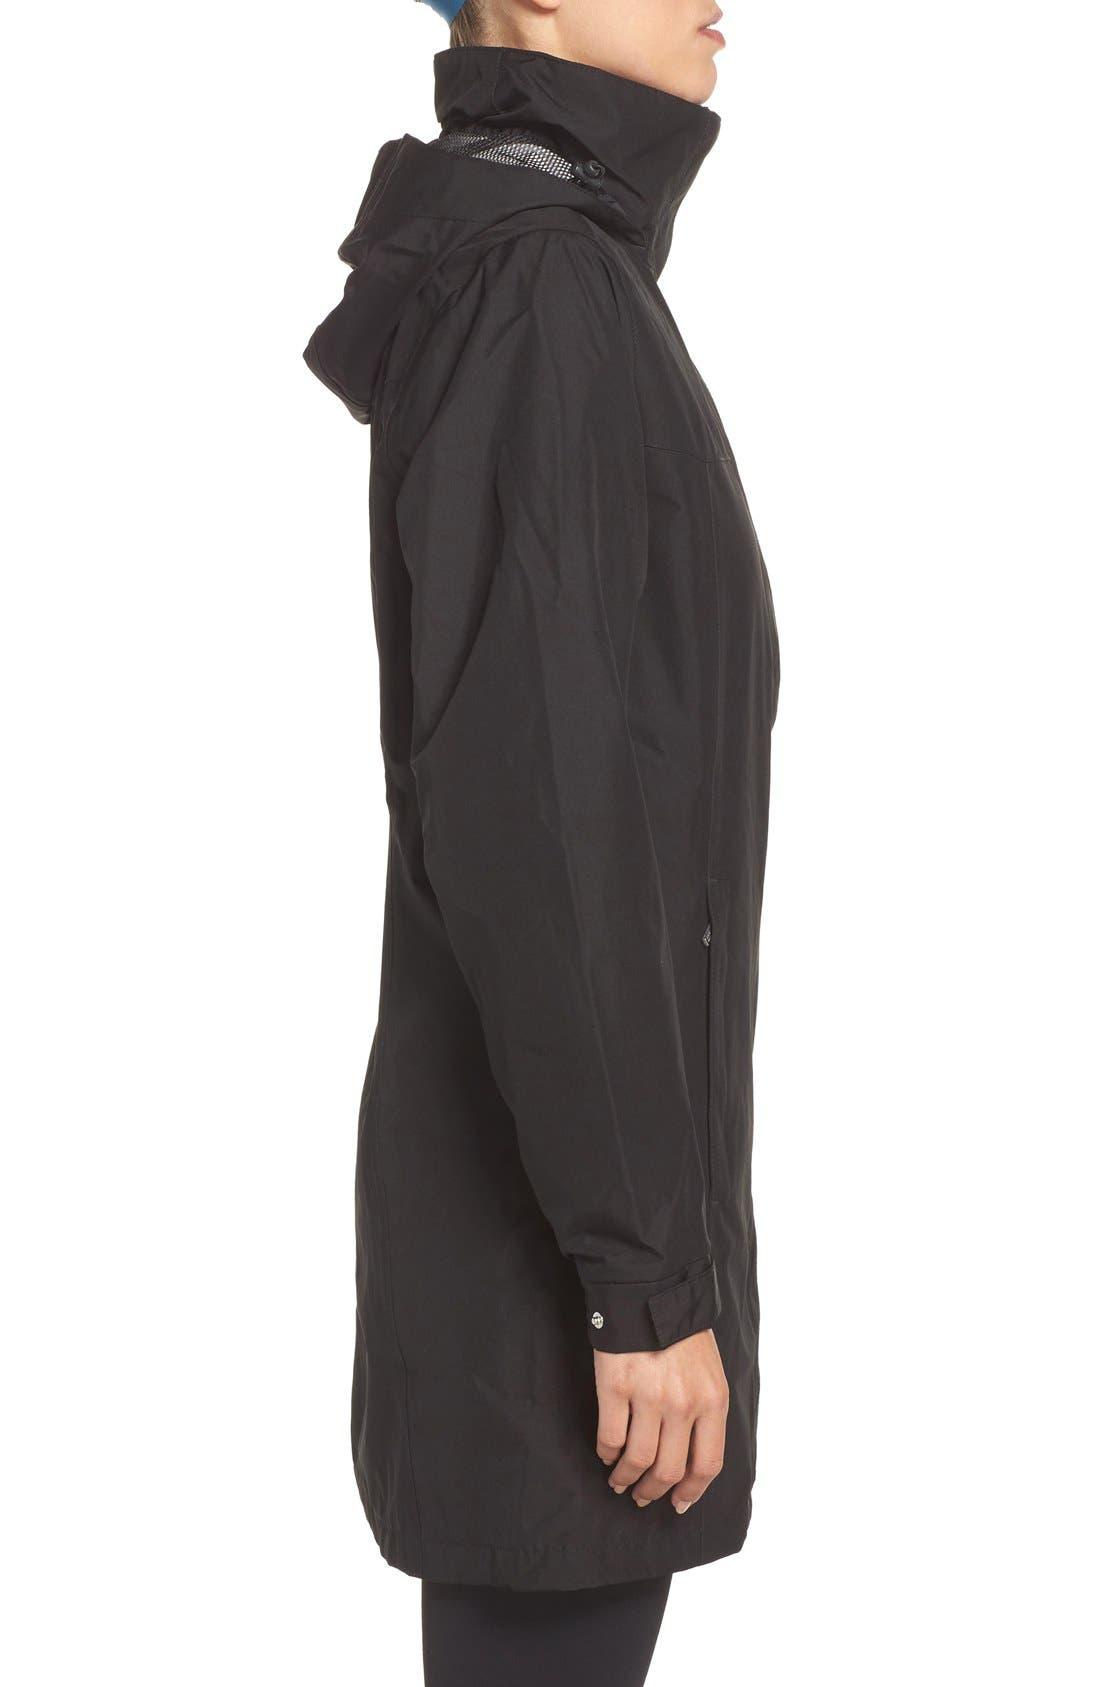 HELLY HANSEN, 'Aden' Helly Tech<sup>®</sup> Raincoat, Alternate thumbnail 6, color, BLACK